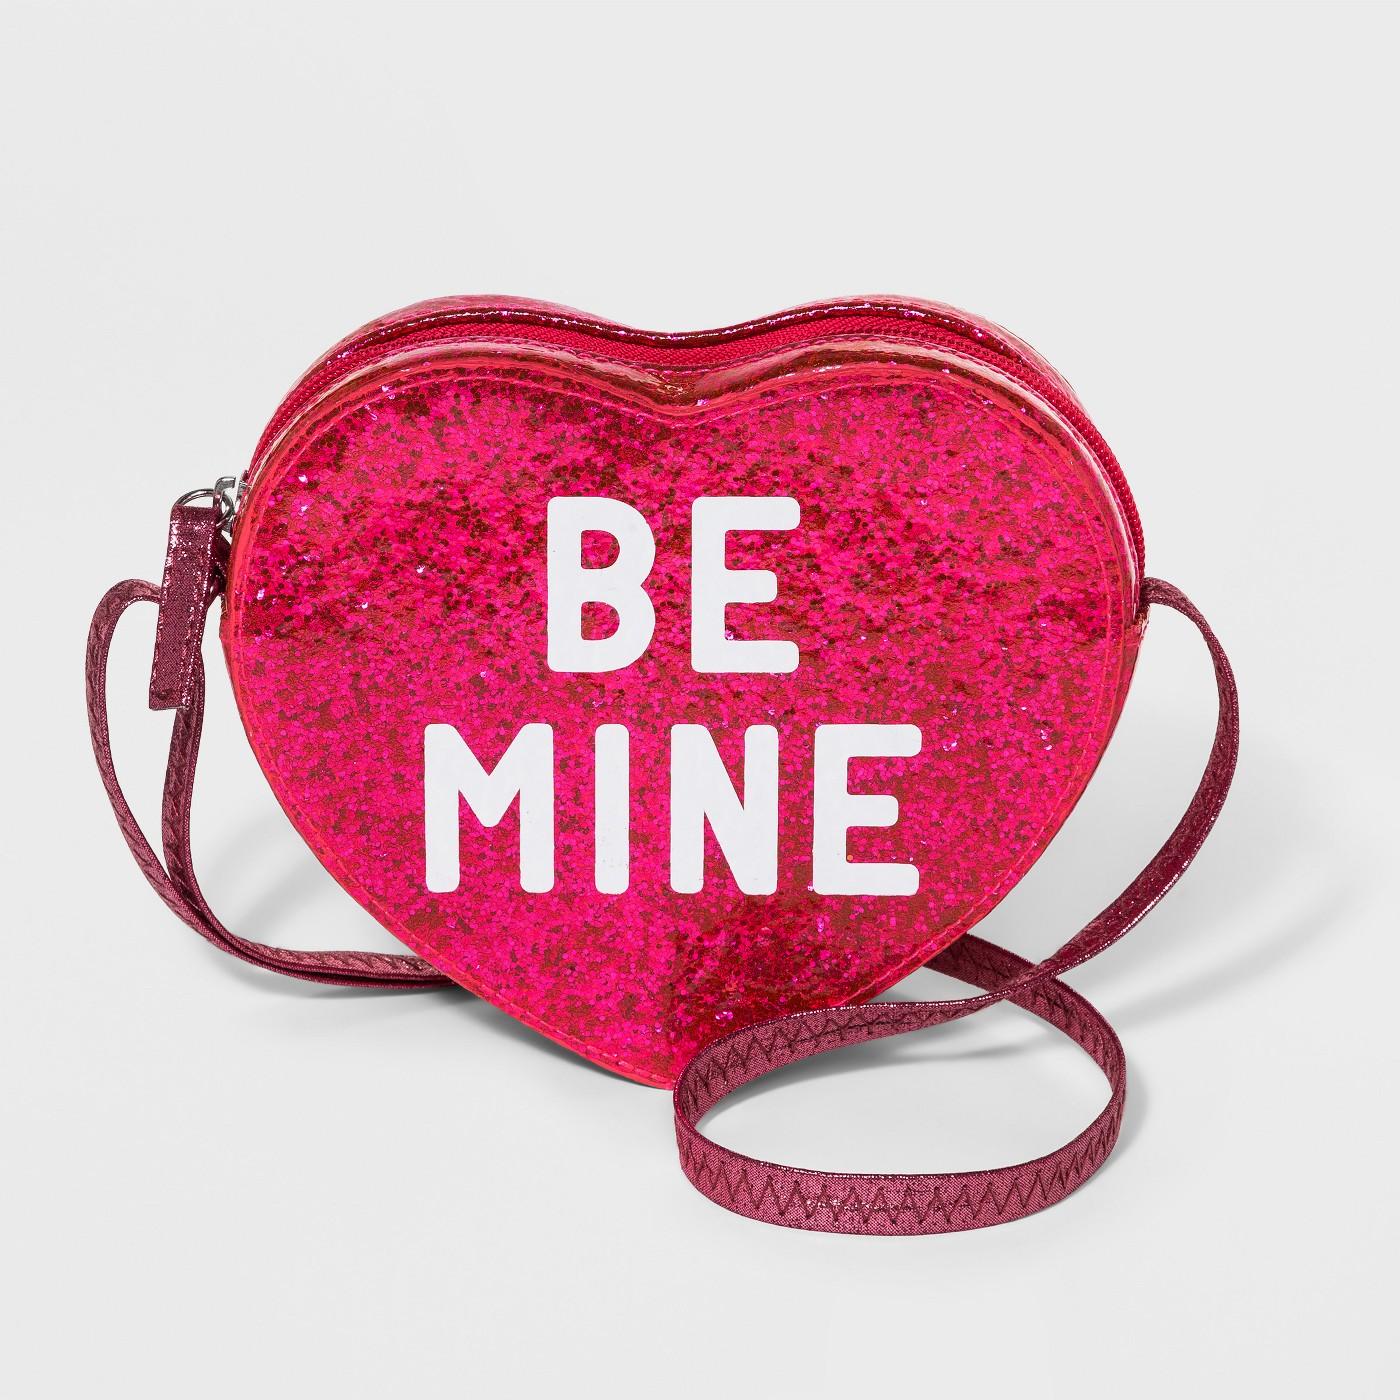 Girls' 'Be Mine' Heart Crossbody Bag - Cat & Jack™ Pink - image 1 of 1